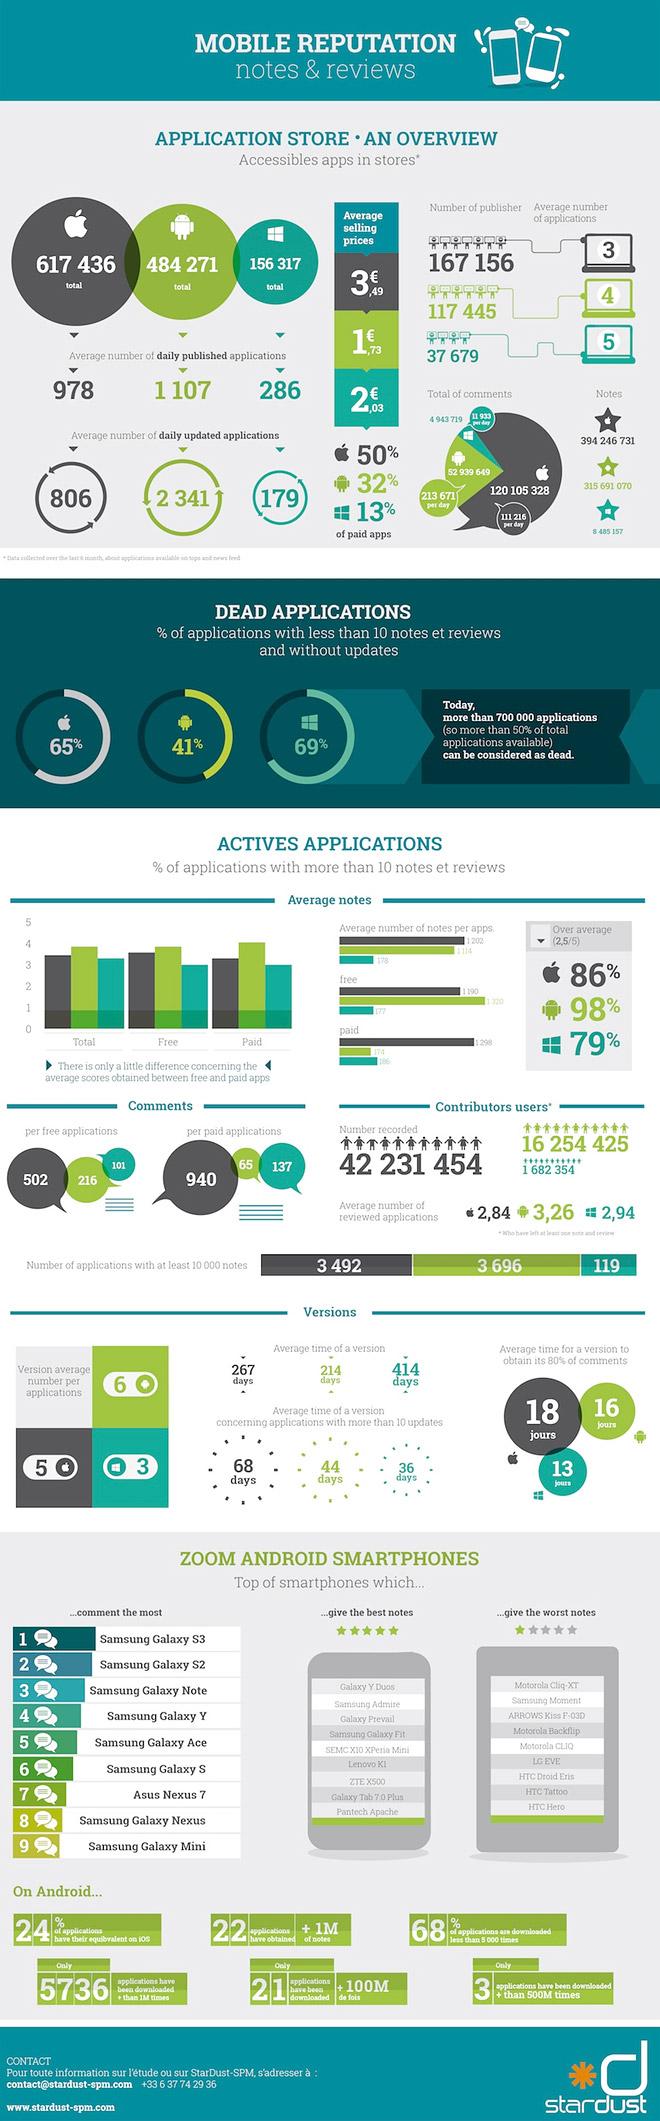 Infographic full